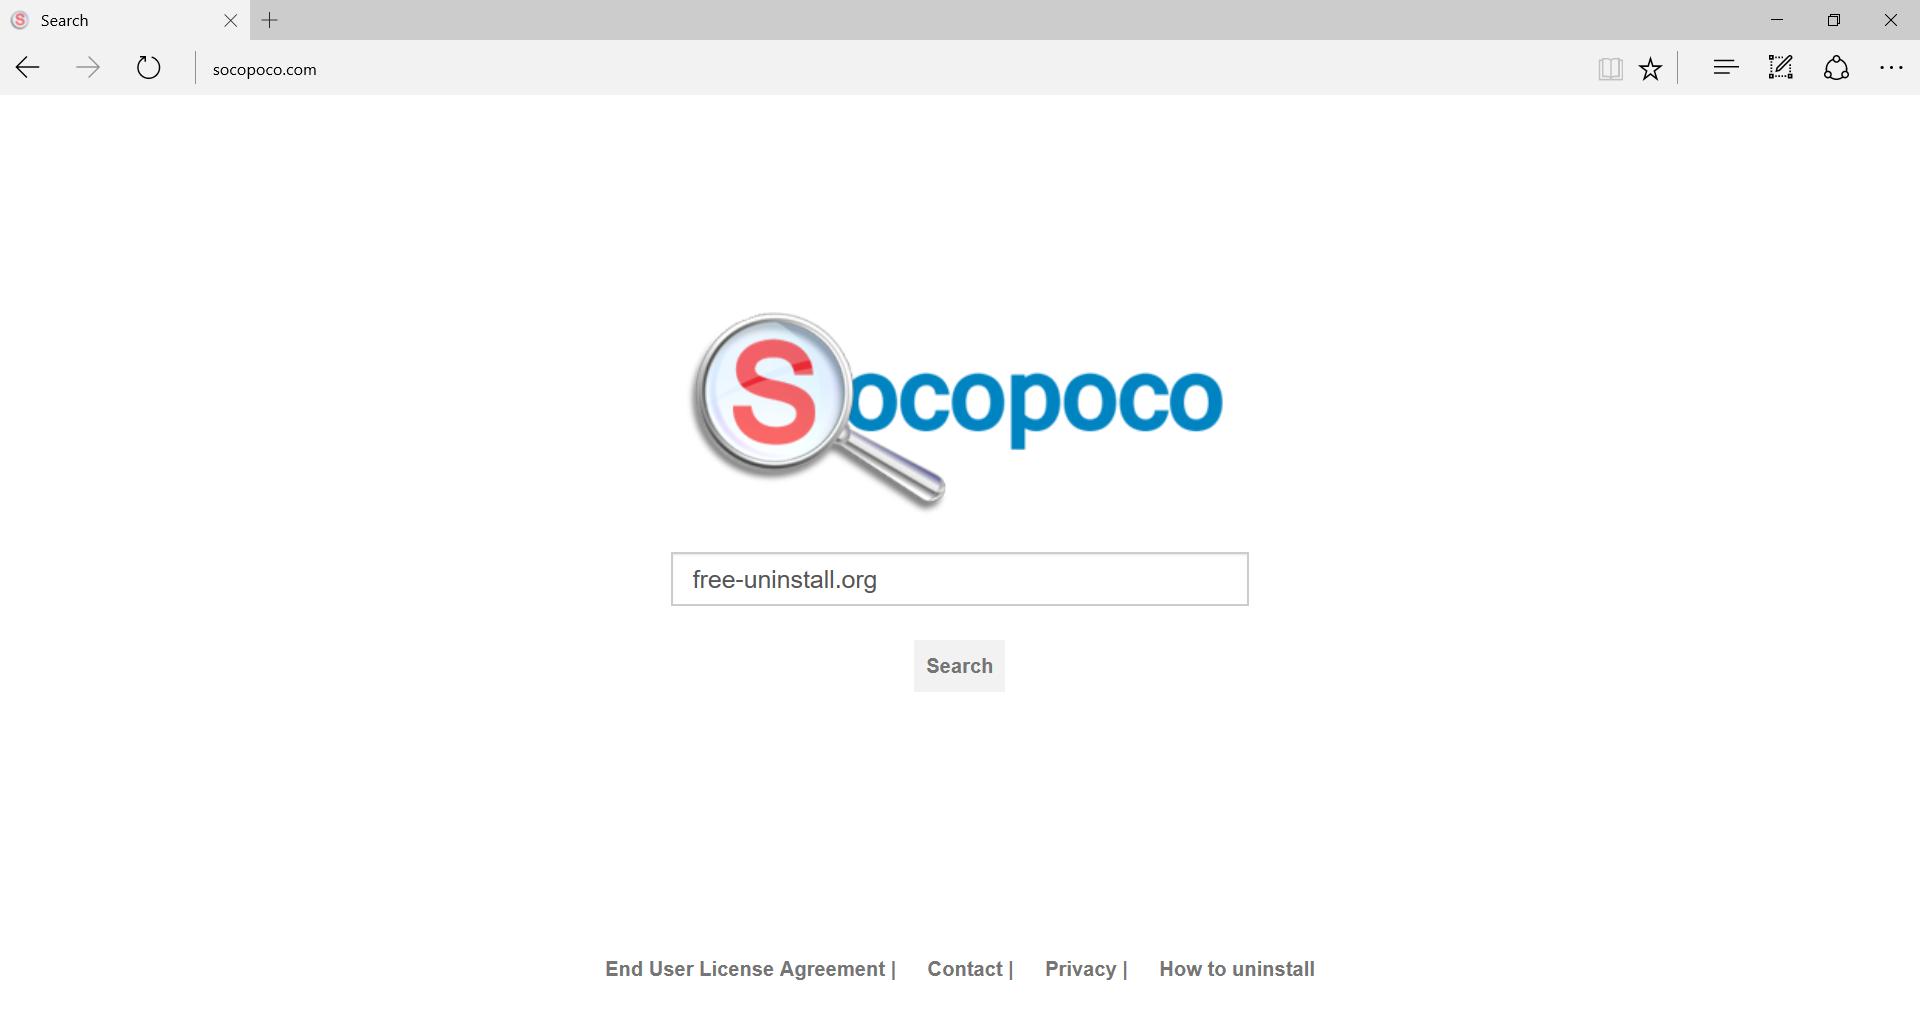 Socopoco.com Hijacker